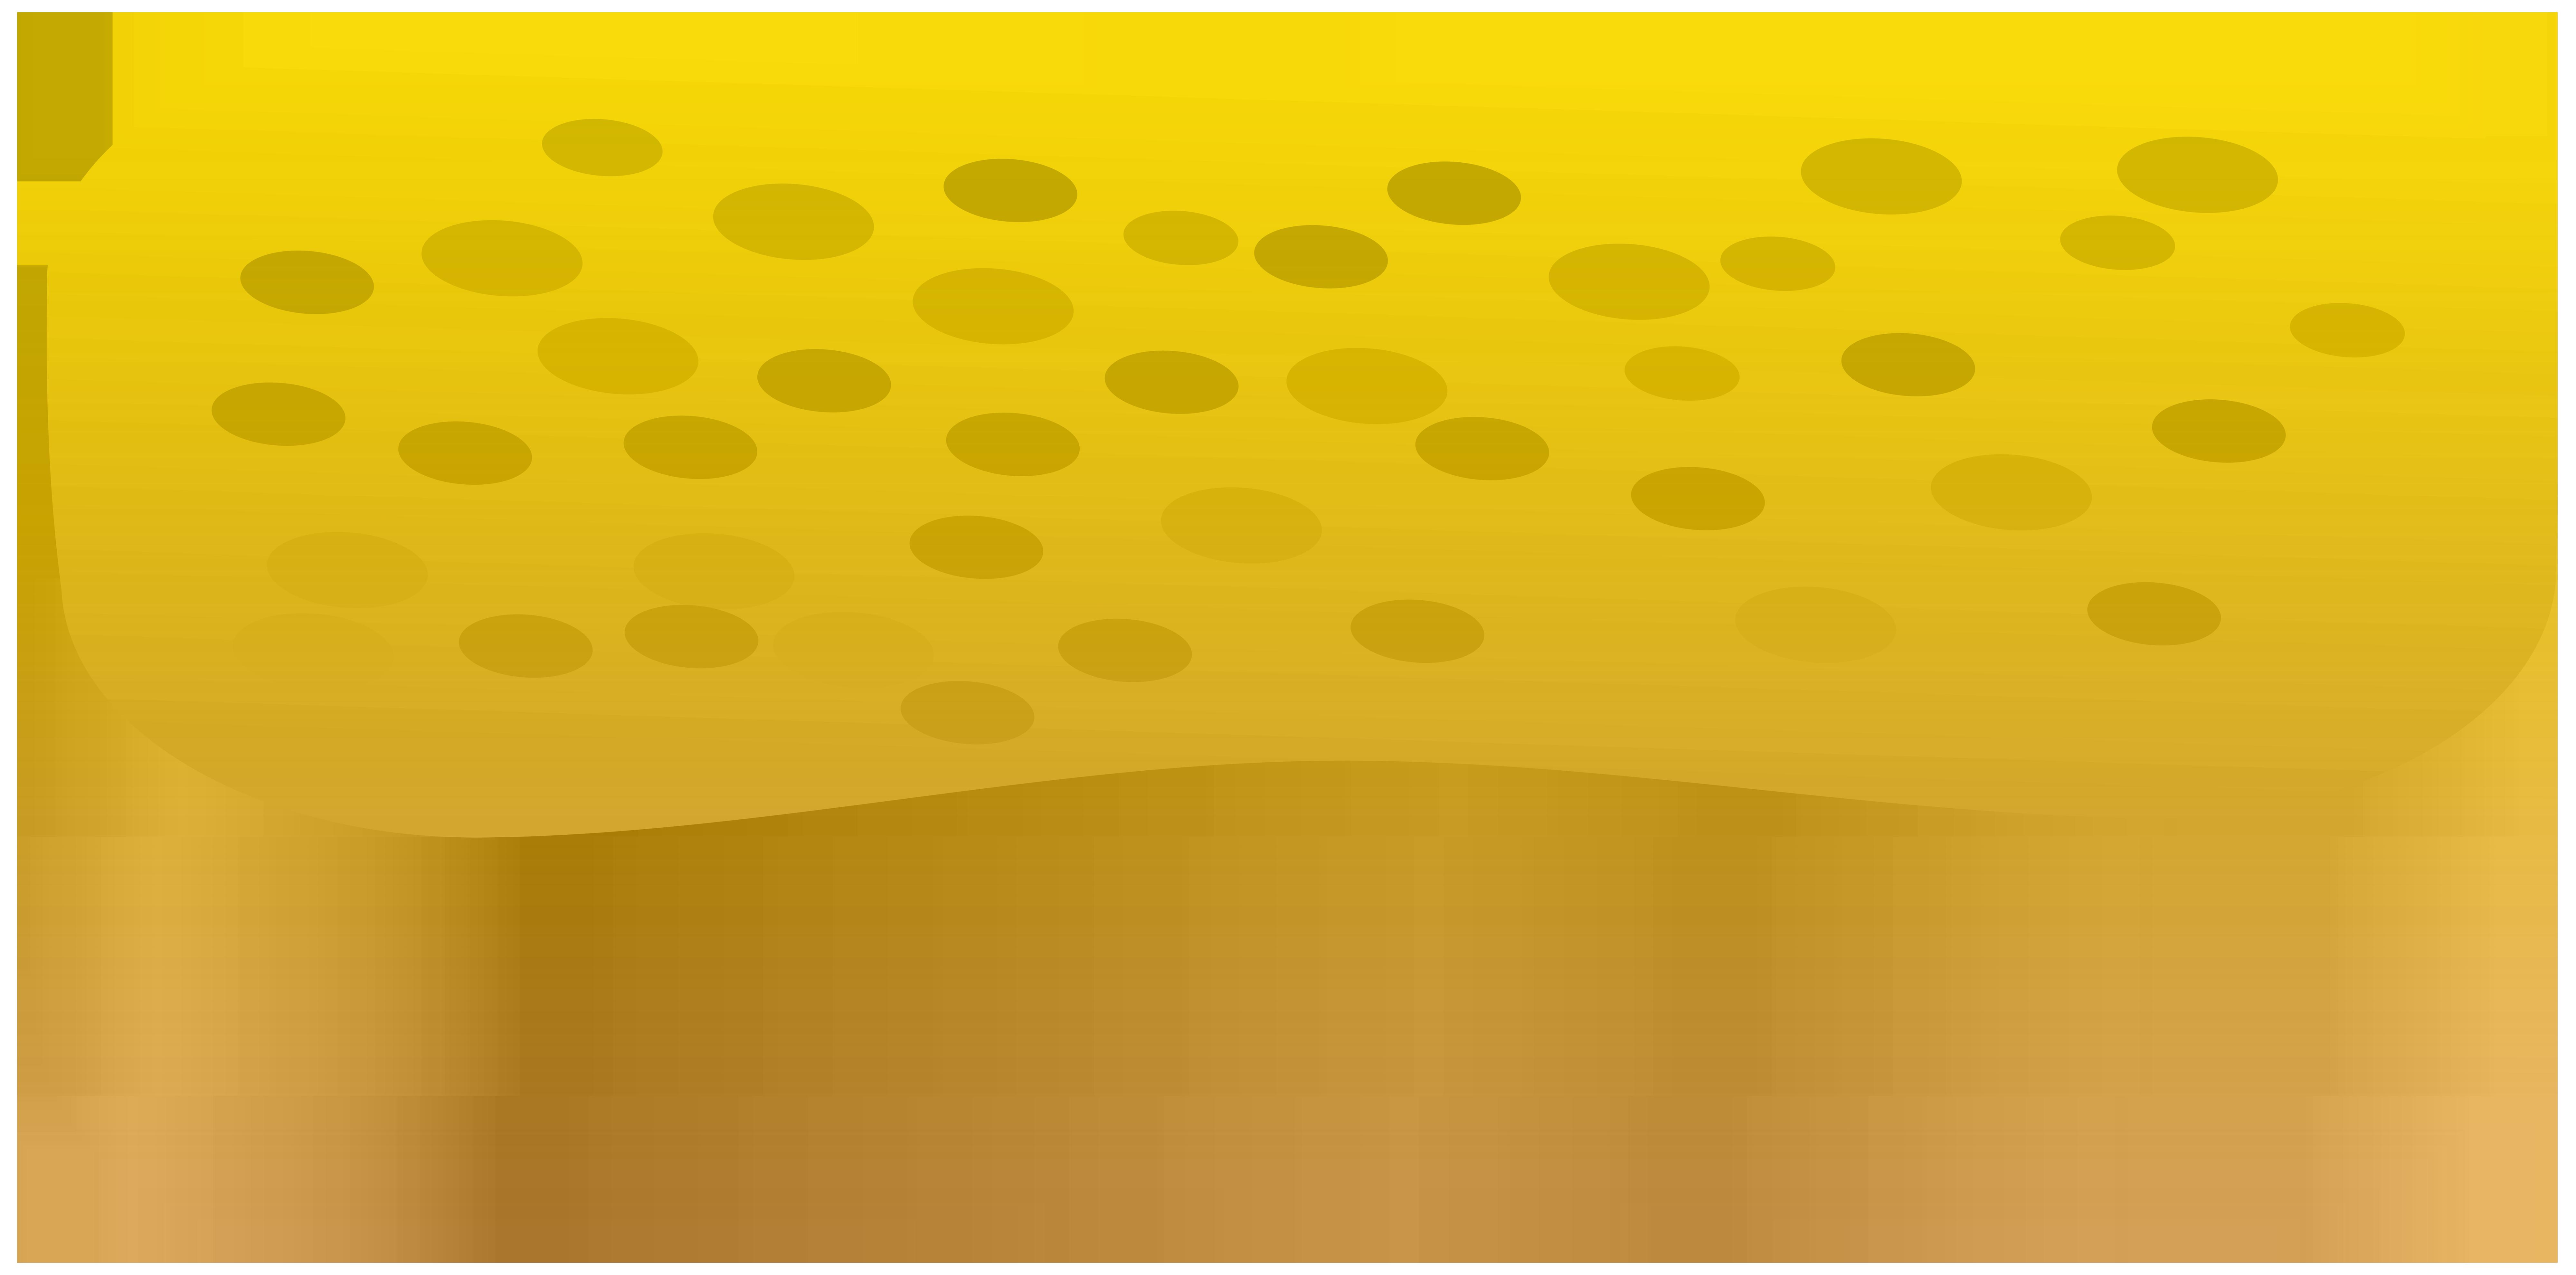 Yellow Sponge PNG Clip Art.